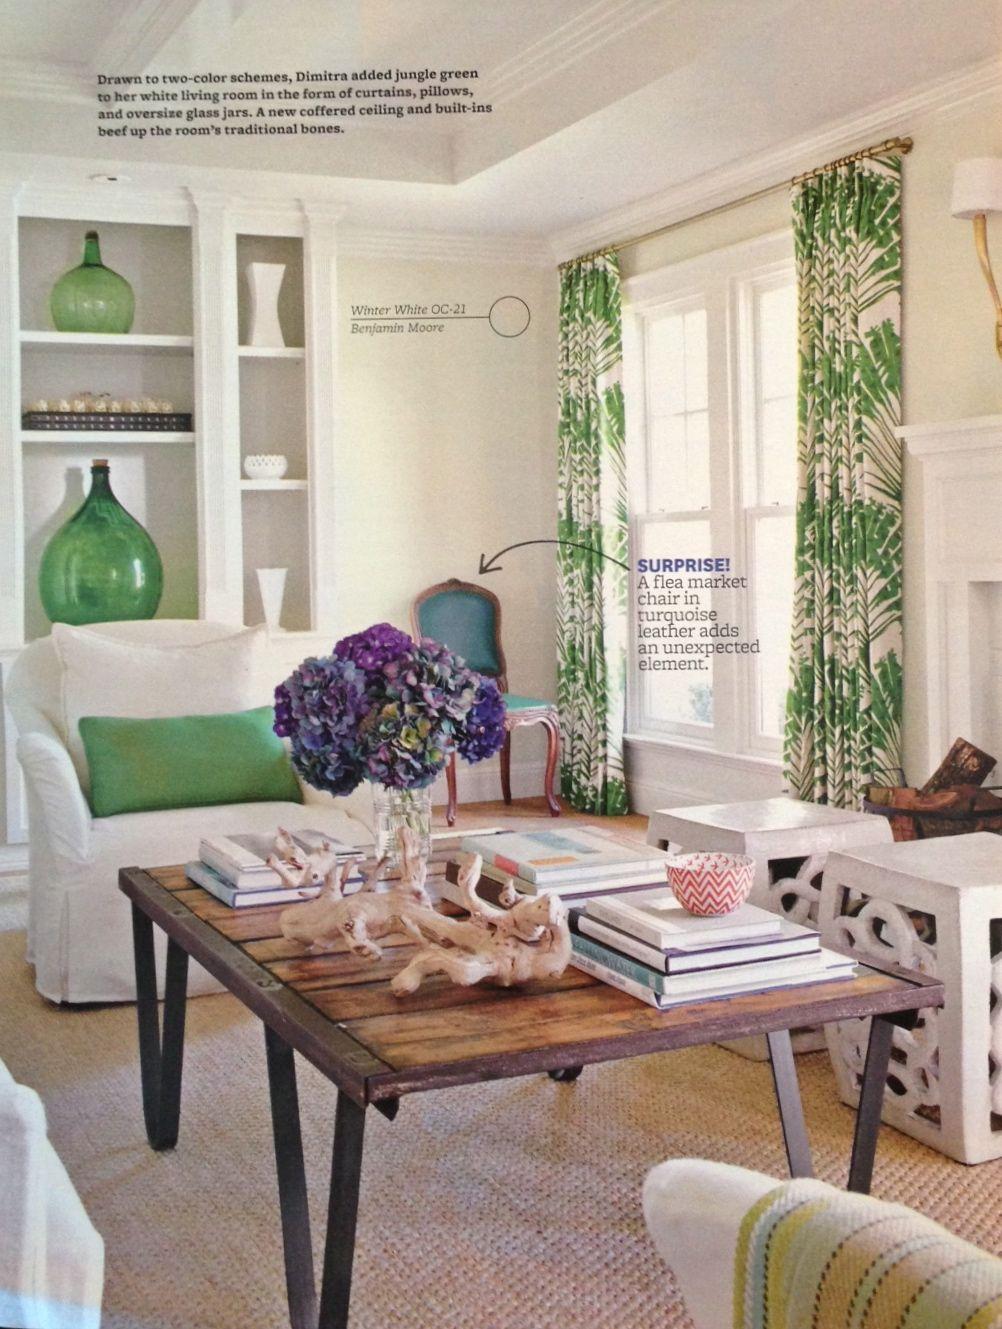 bhg april 2014  evars  anderson interior design with